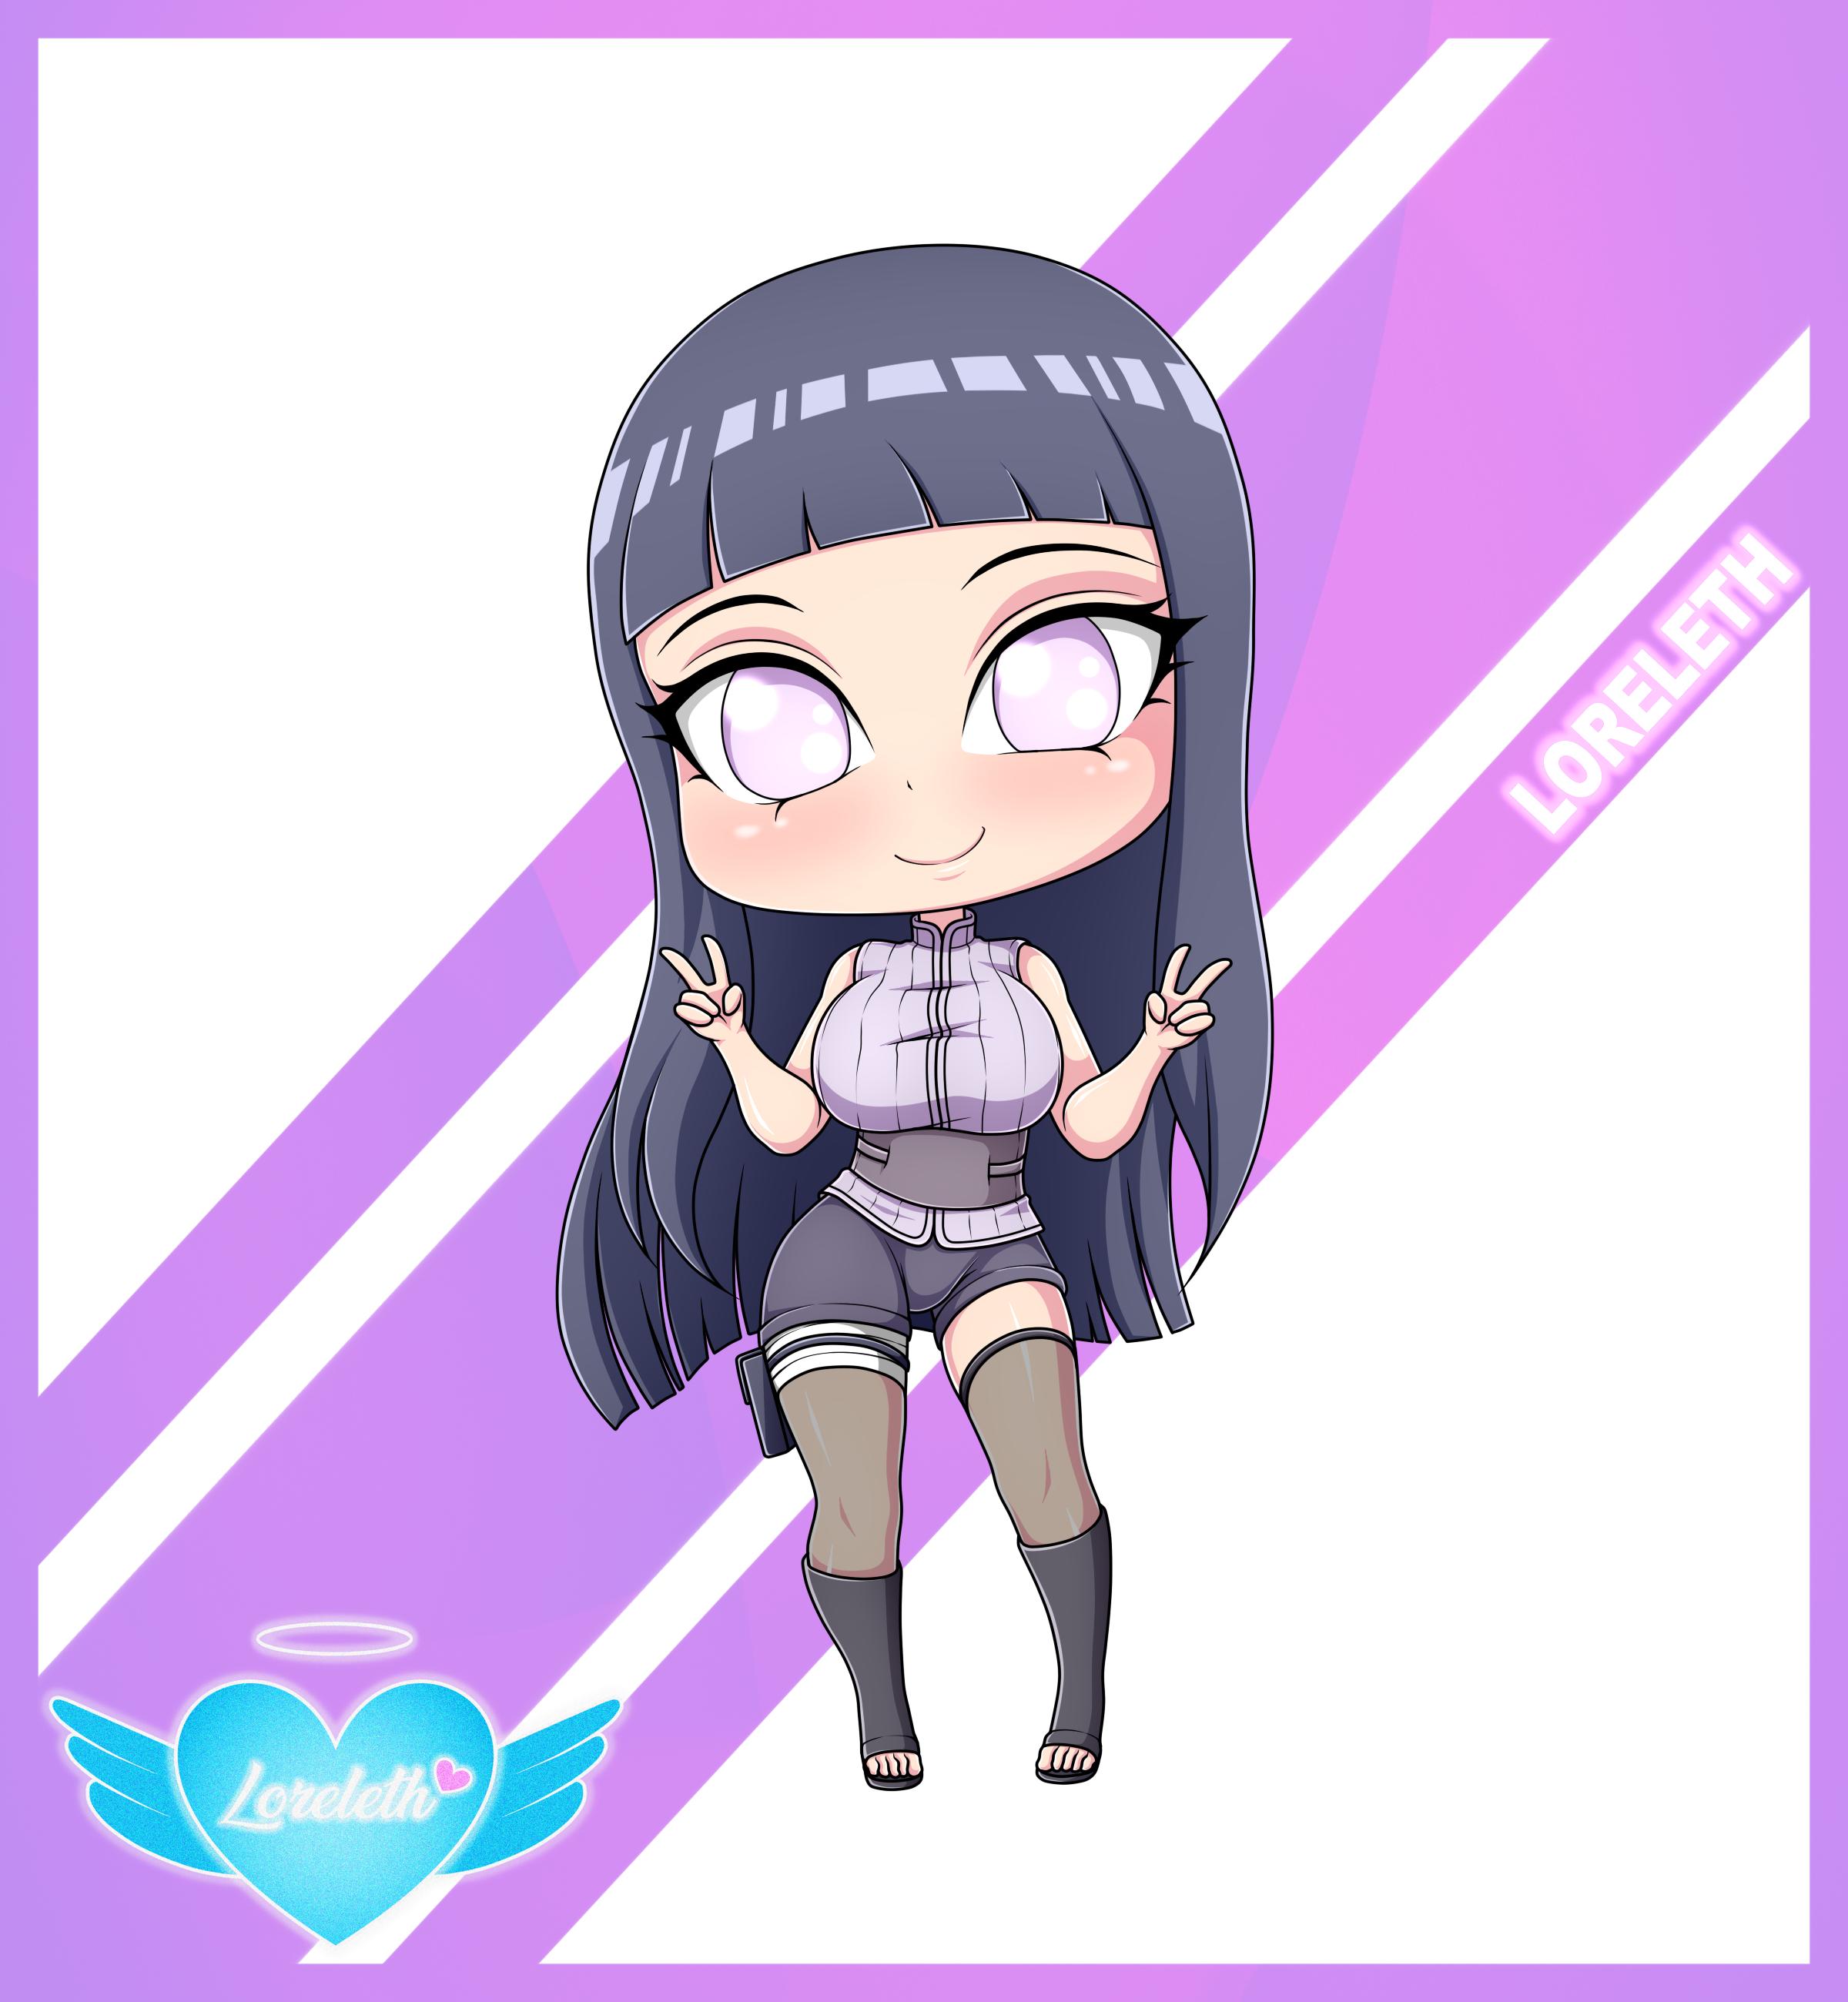 Cute Chibi Girl 30 (Commission)